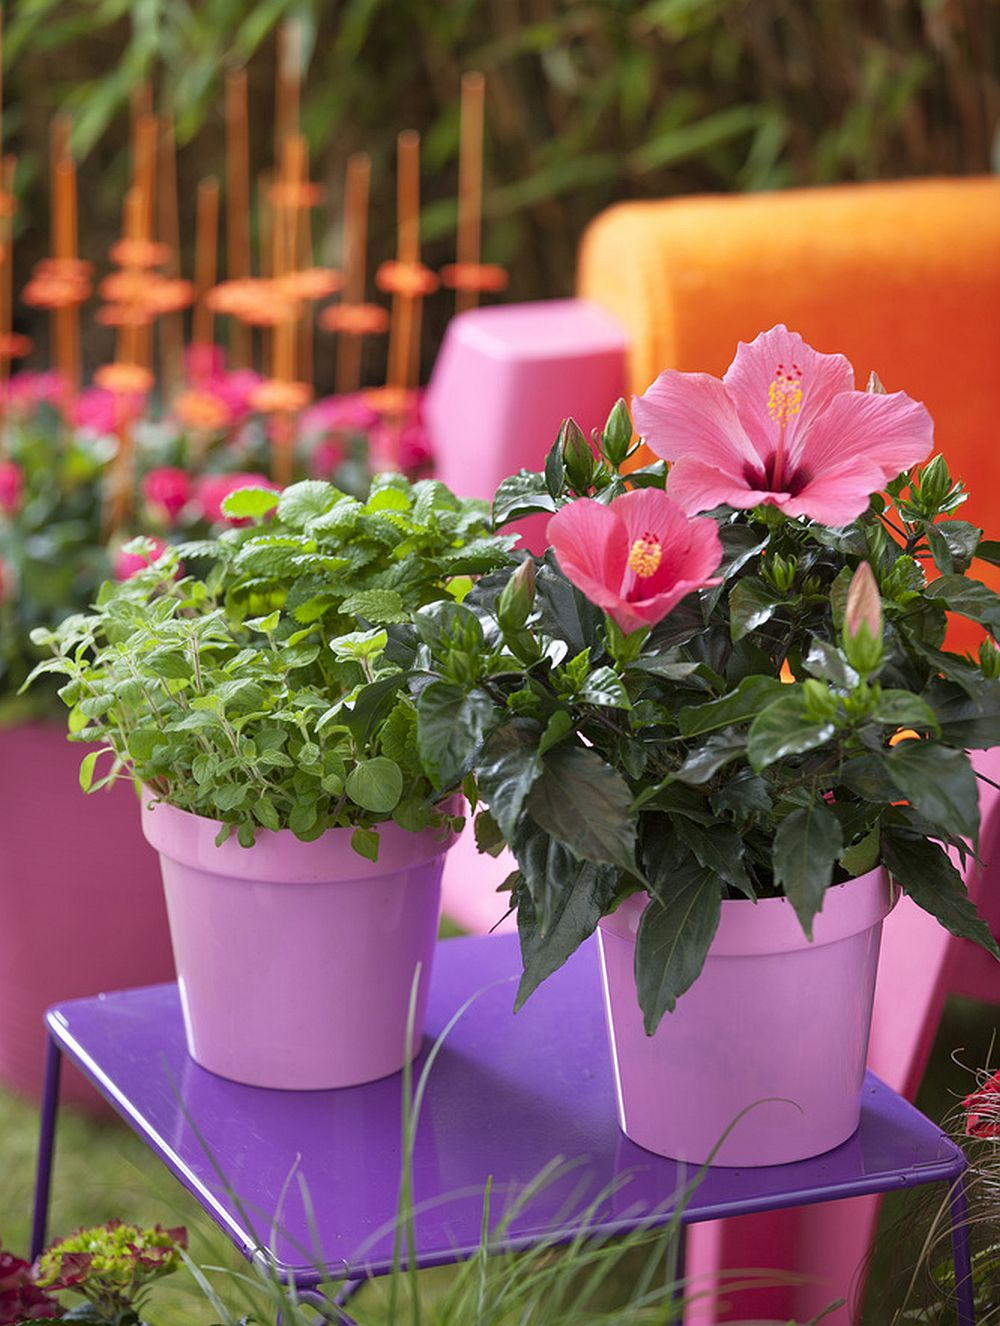 adelaparvu.com despre trandafirul japonez, trandafirul chinezesc, Hibiscus, text Carli Marian, Foto Floradania (14)